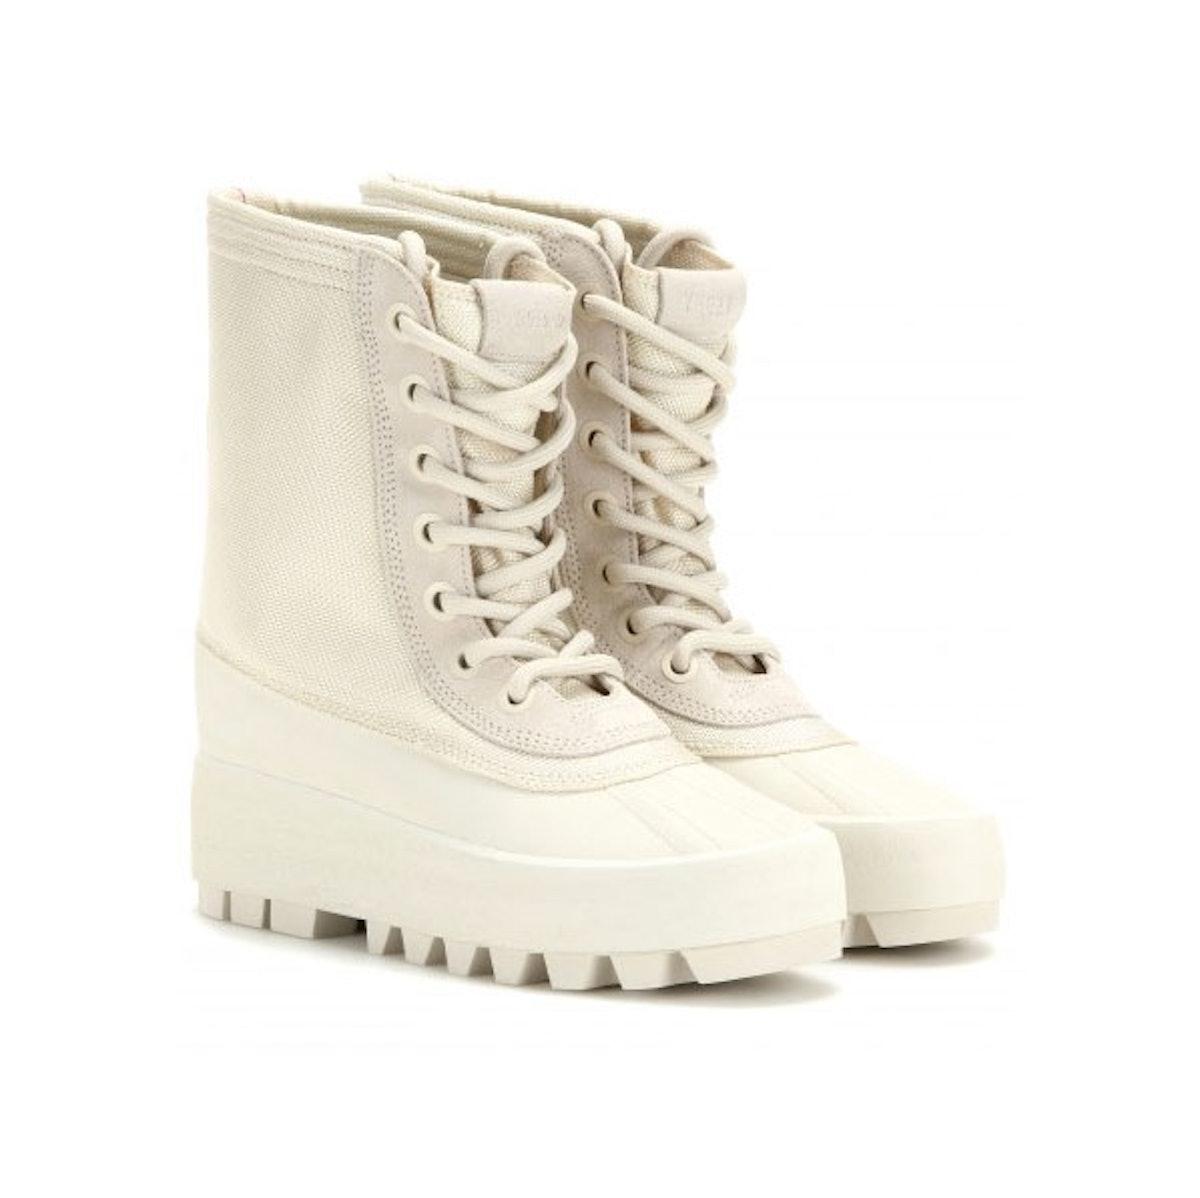 Yeezy 950 boots